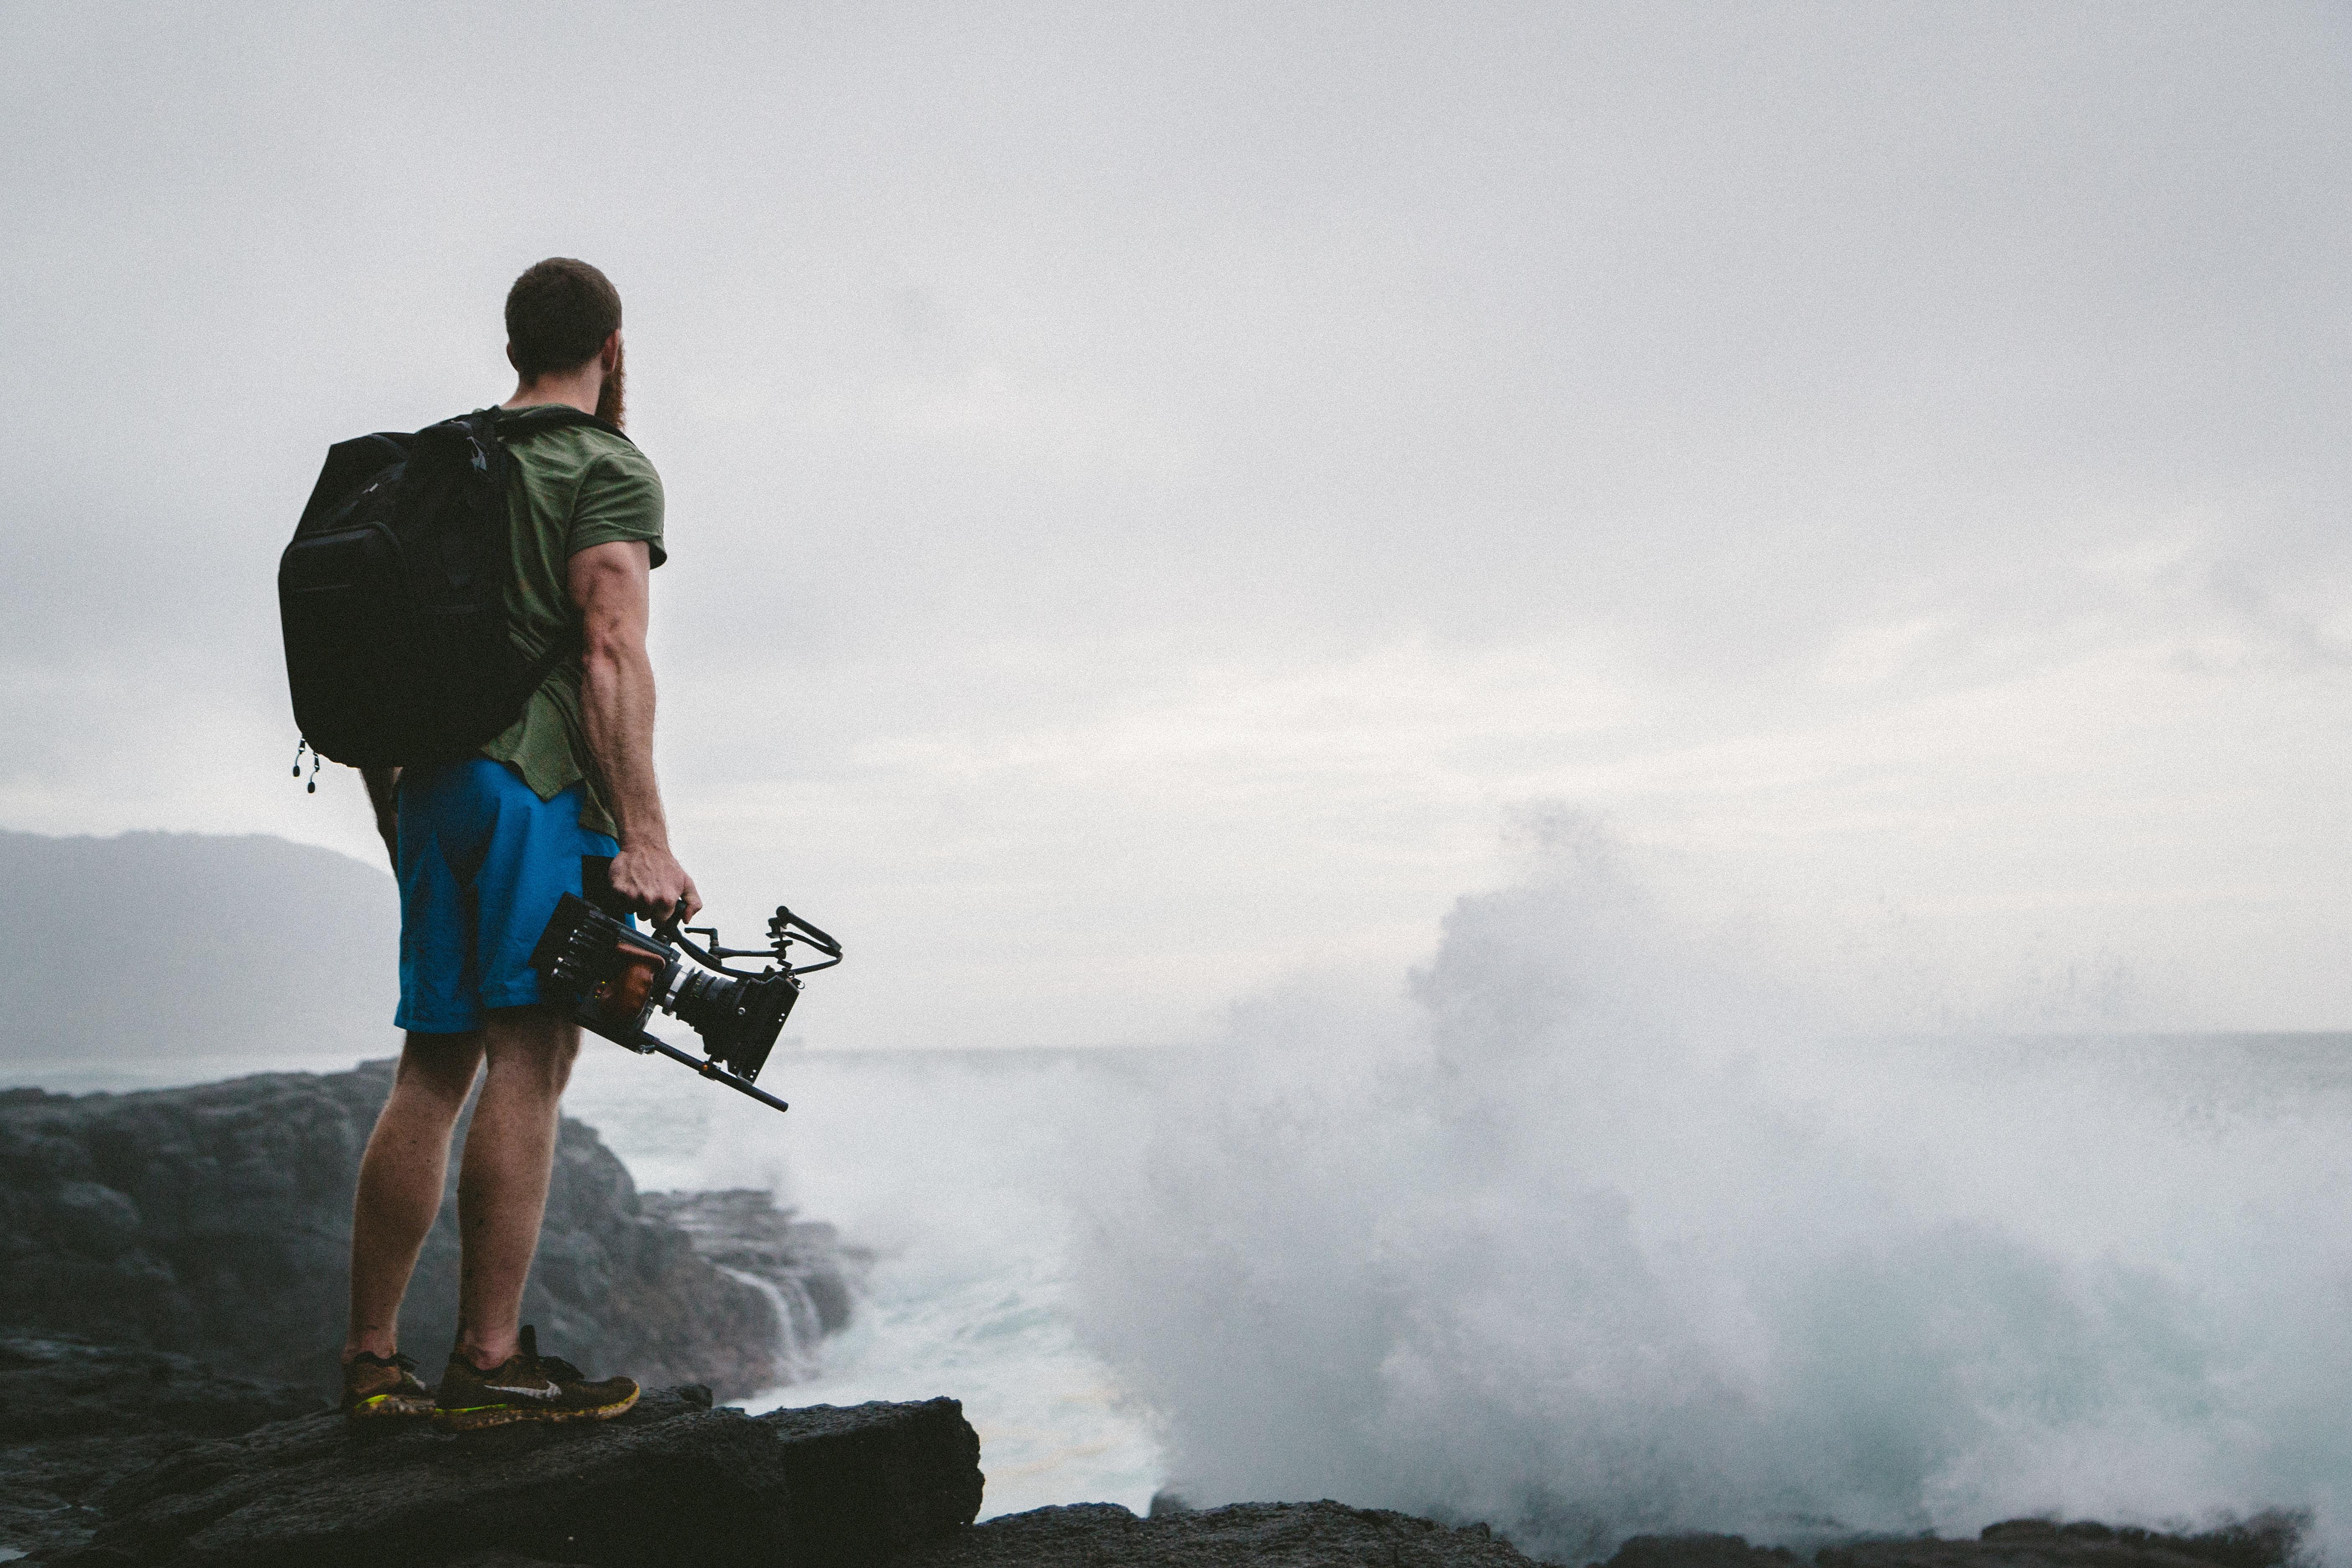 man in green shirt standing near clouds